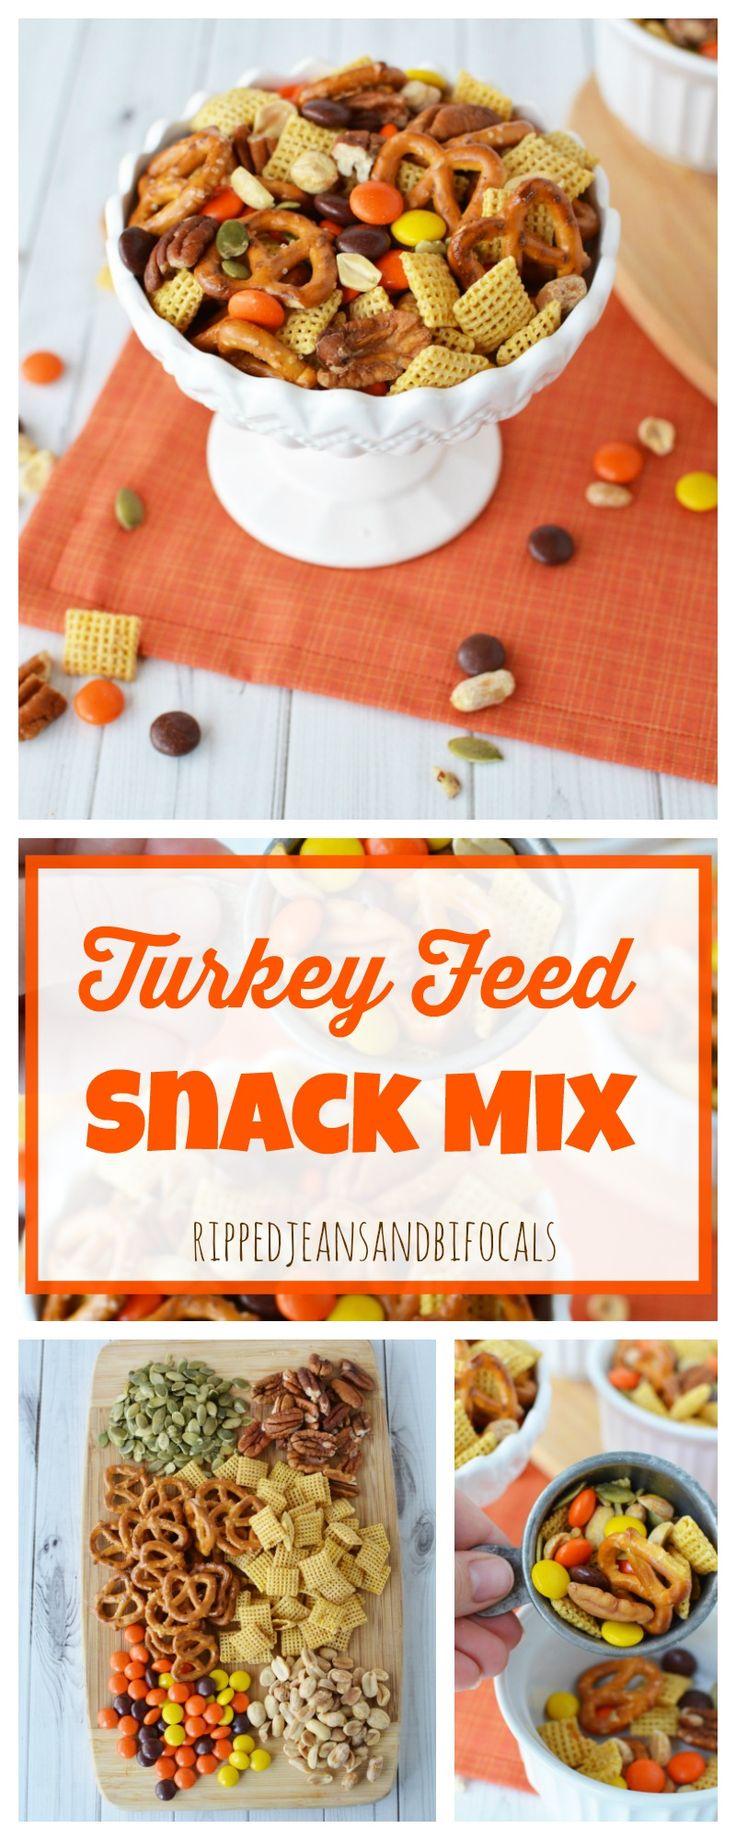 Turkey Feed Snack Mix